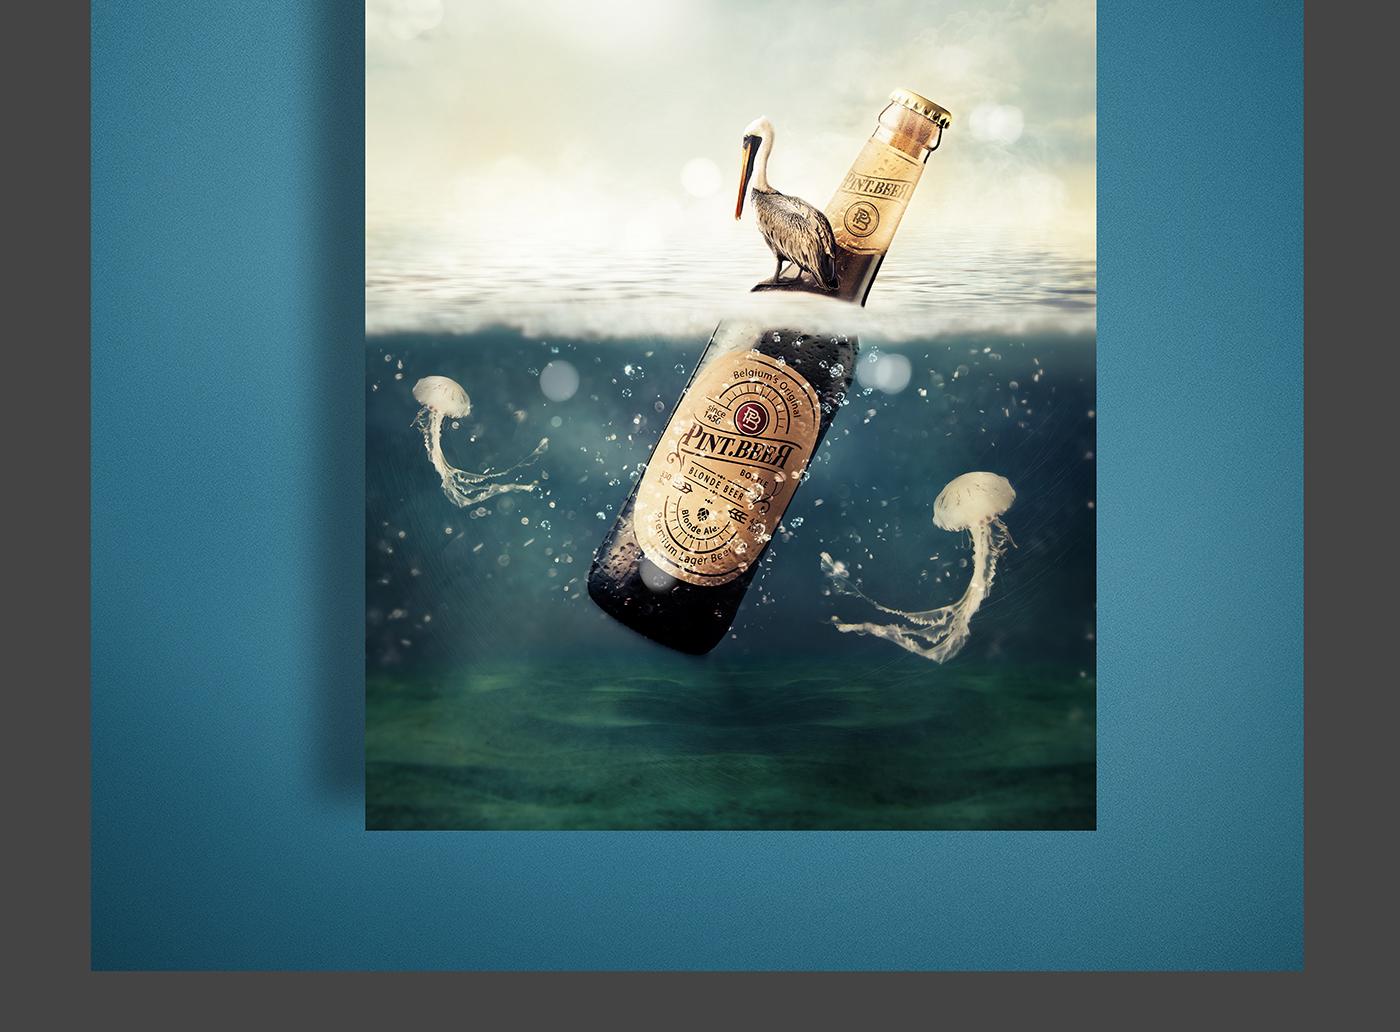 #graphicdesign #design #art #artwork #flatvector #flatdesign #designspiration #branding #designer #characterdesign #photoshop #drawing #adobe #beautyschool #creative #lightroom #photography #magnumphotos #editorial #sunset #sunrise #thedesigntimes #artistic #pr0ject_uno #edit #igcreative_editz #gallery #artshow #artlife #surreal